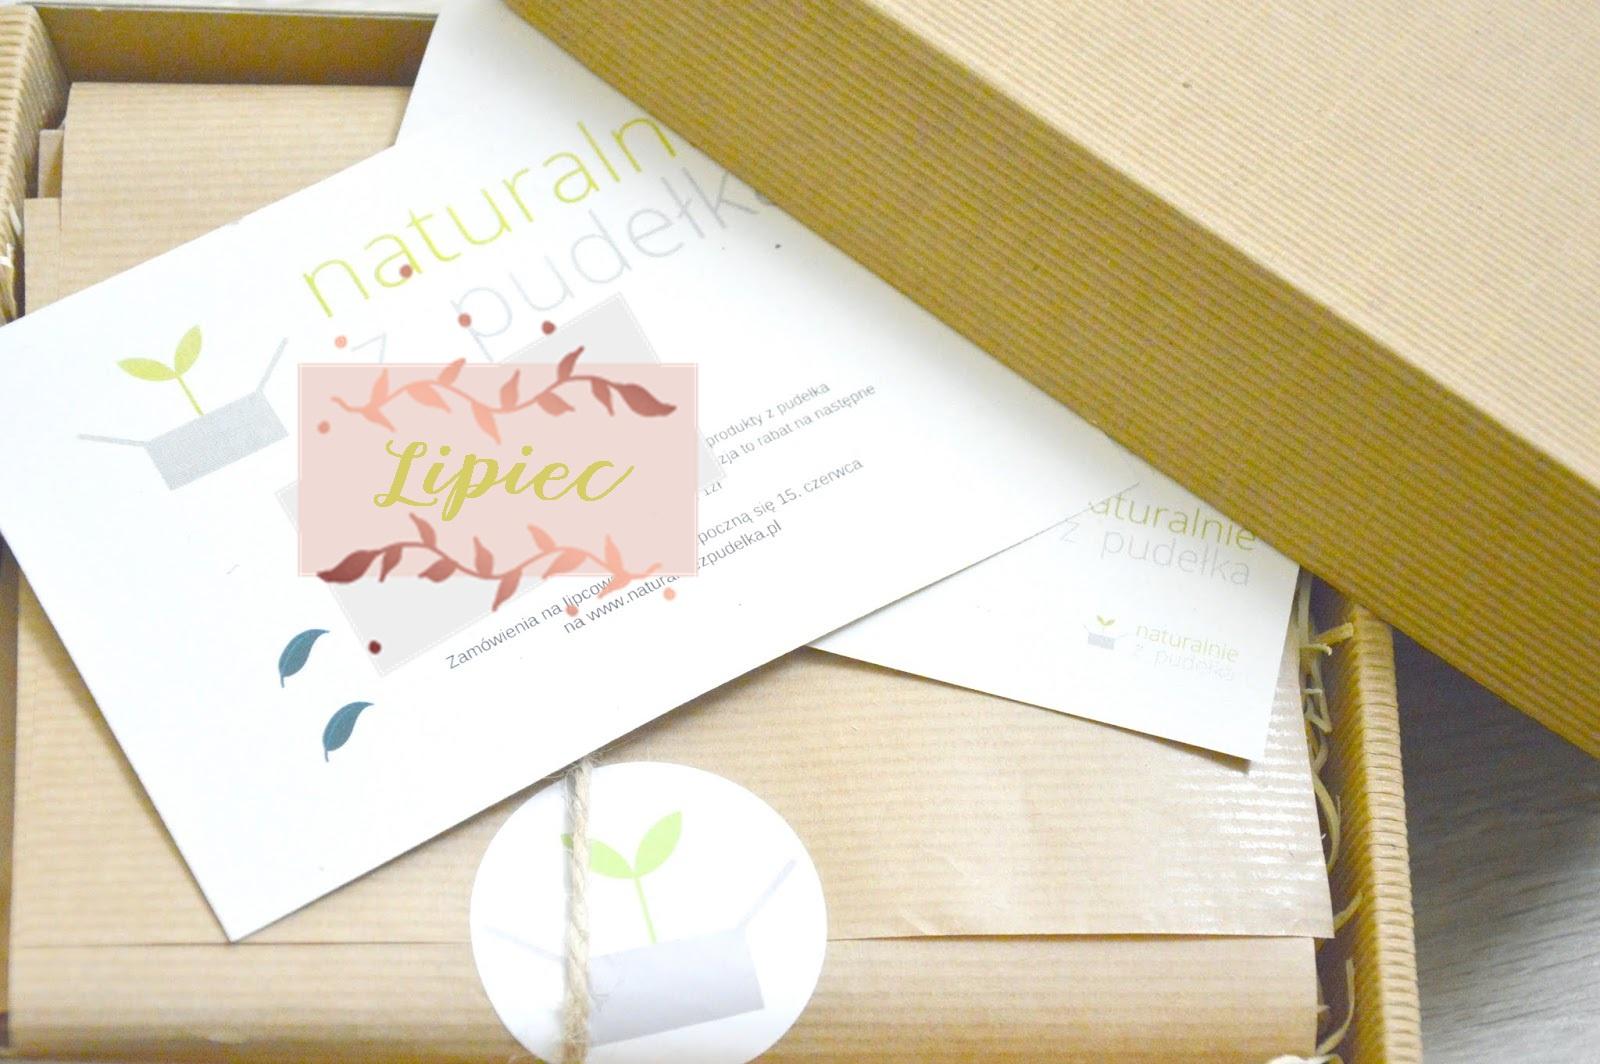 edycja lipcowa pudełka, kosmetyki naturalne